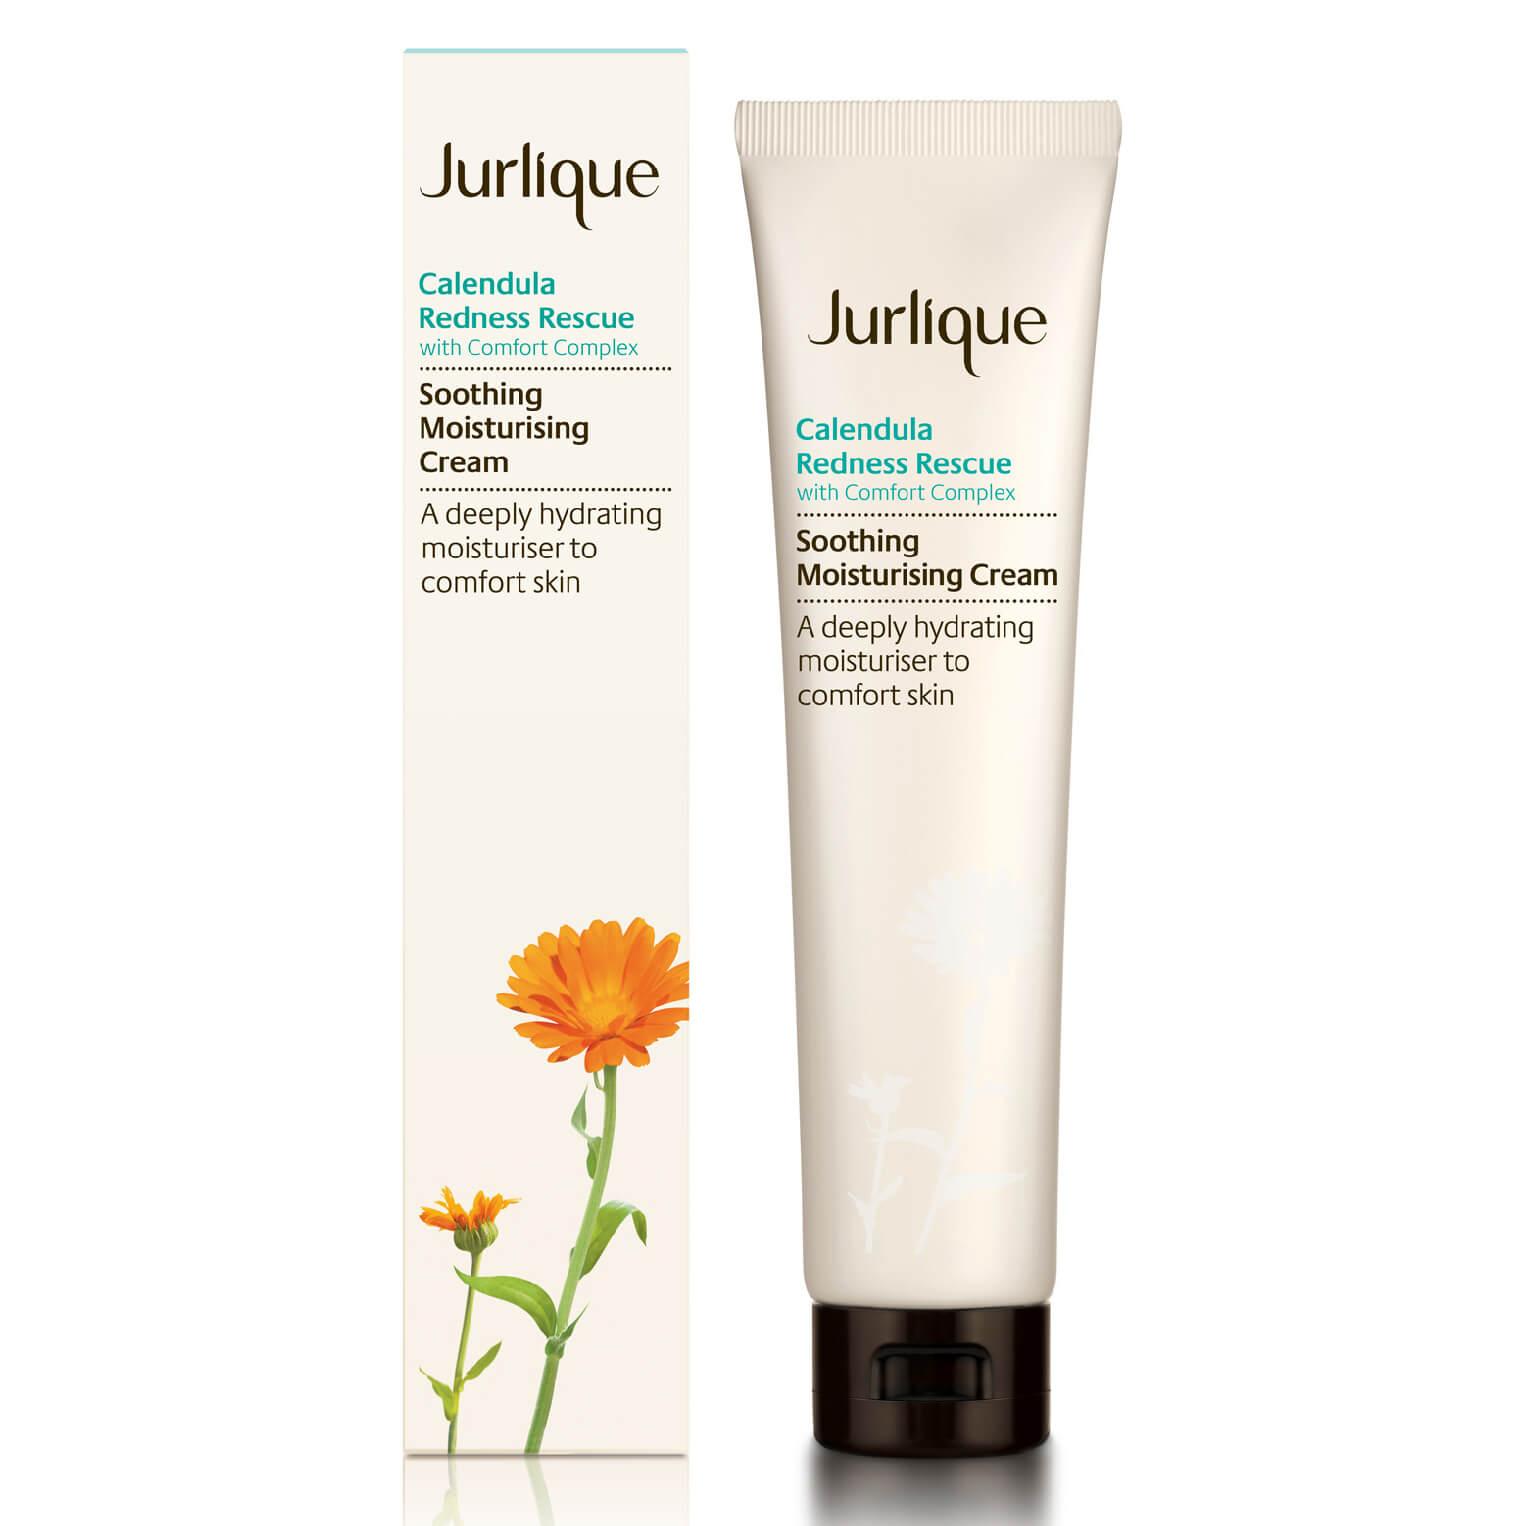 jurlique calendula redness rescue soothing moisturizing cream (1.4oz)